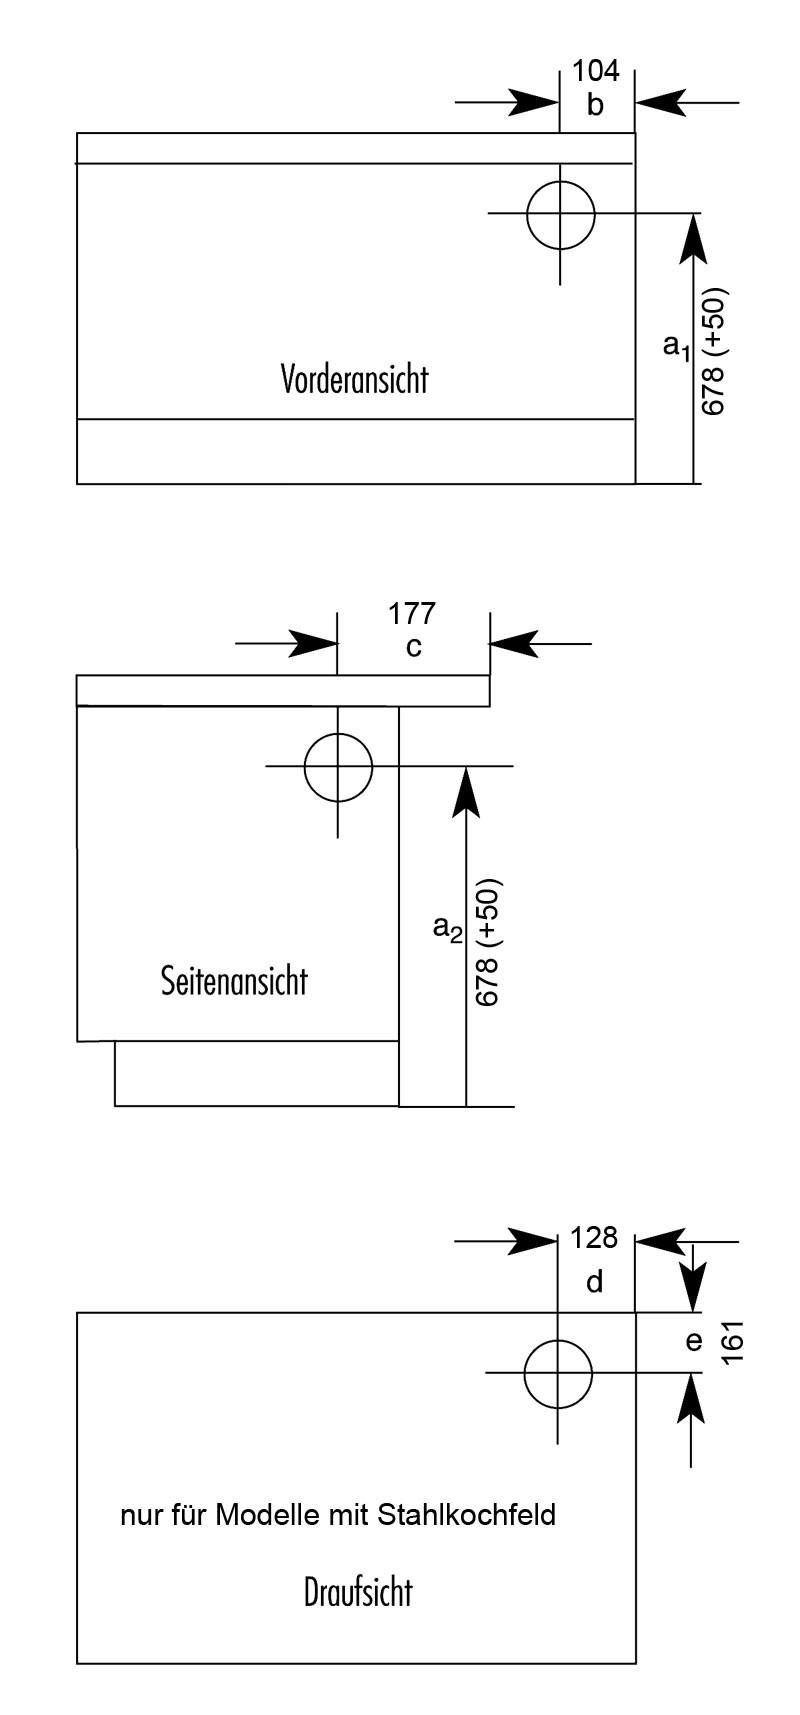 Küchenherd / Kohleherd Wamsler K138F schwarz Stahl Anschluss links Bild 2